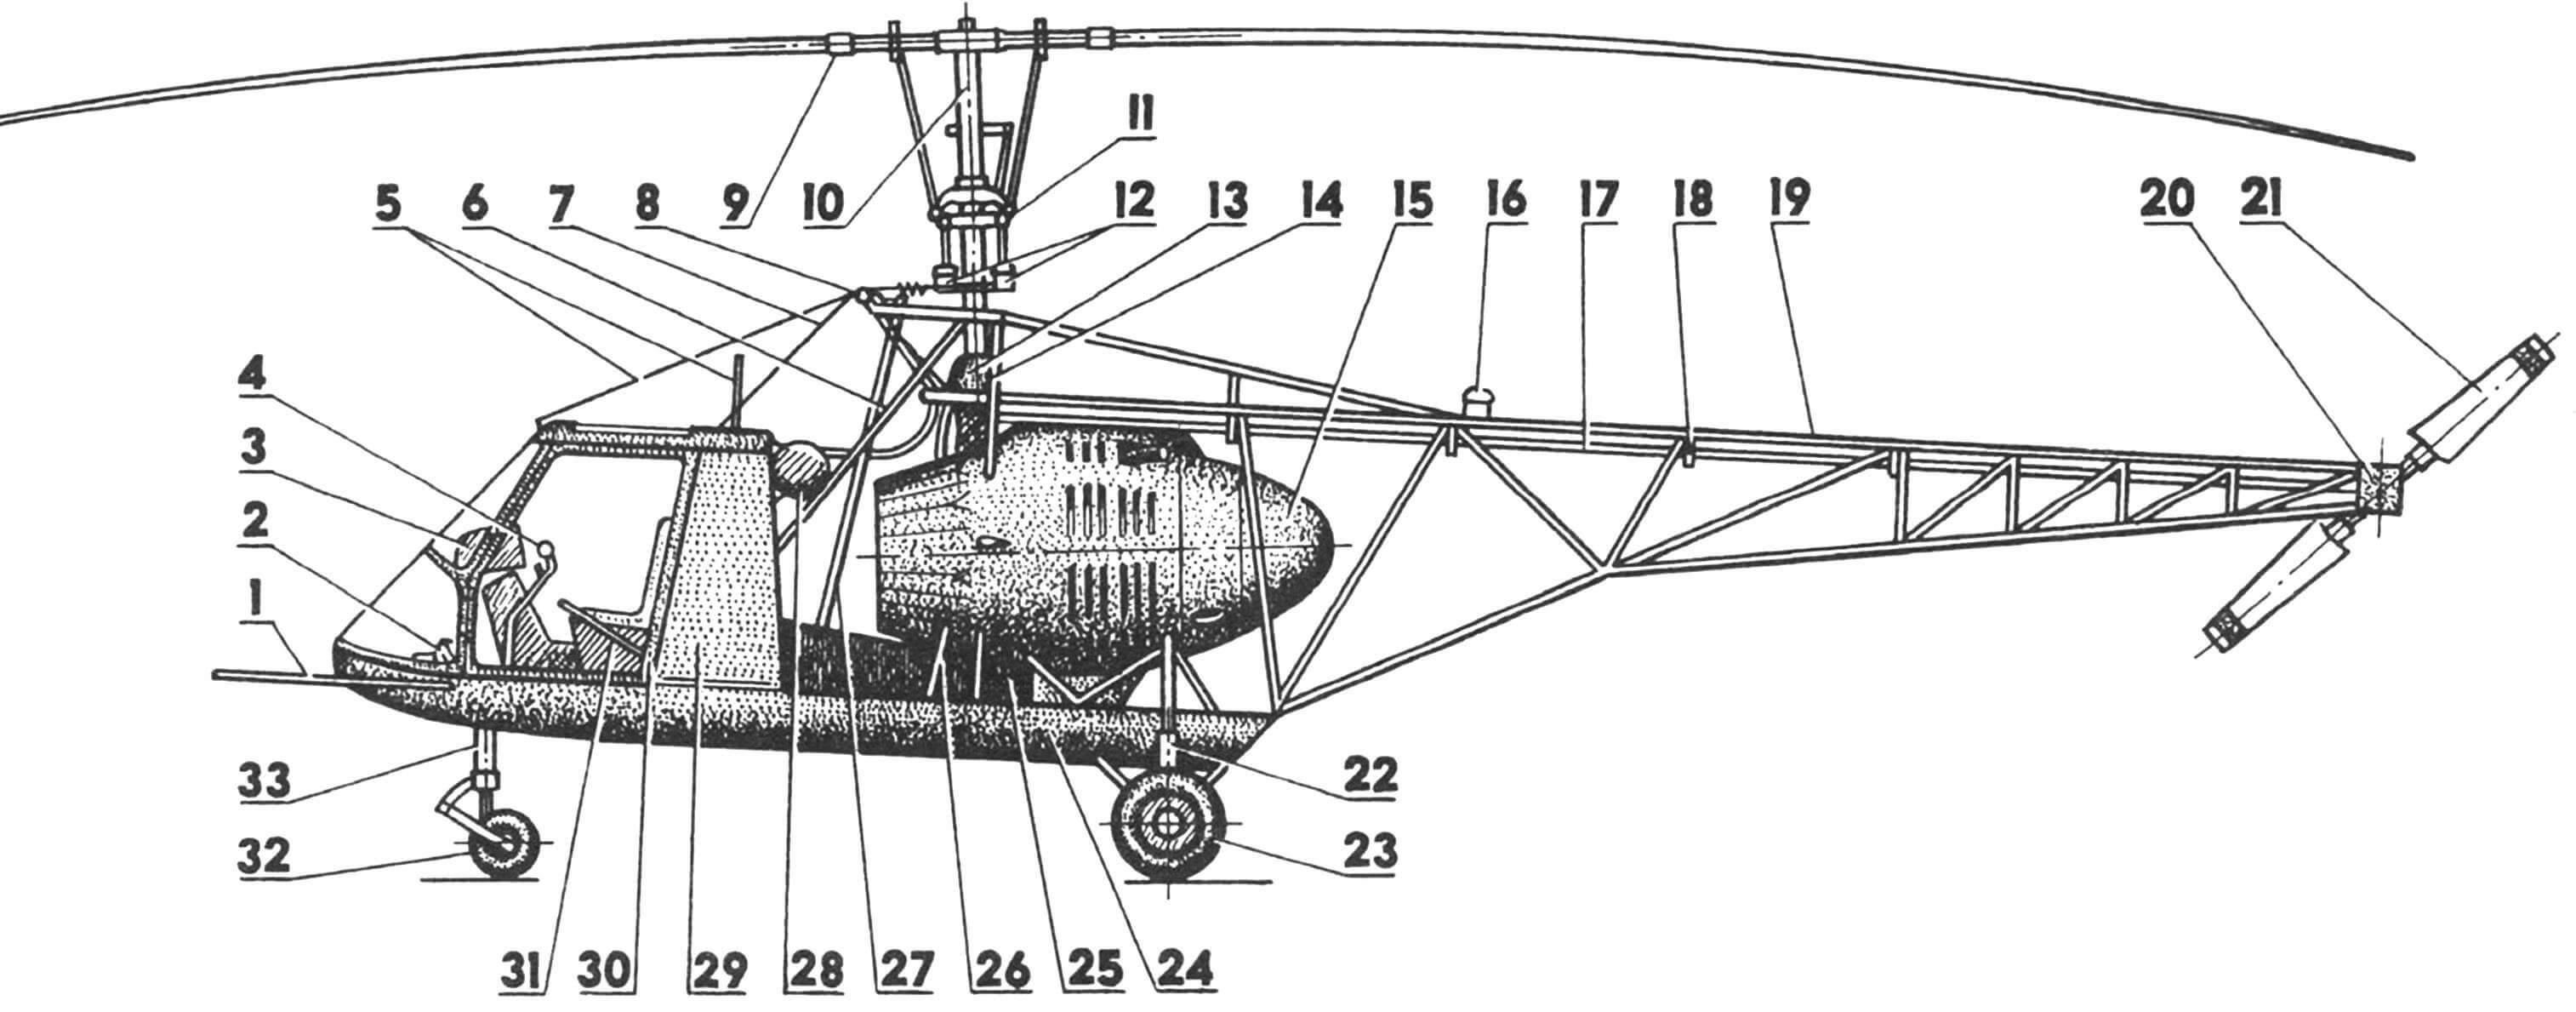 Компоновка вертолета